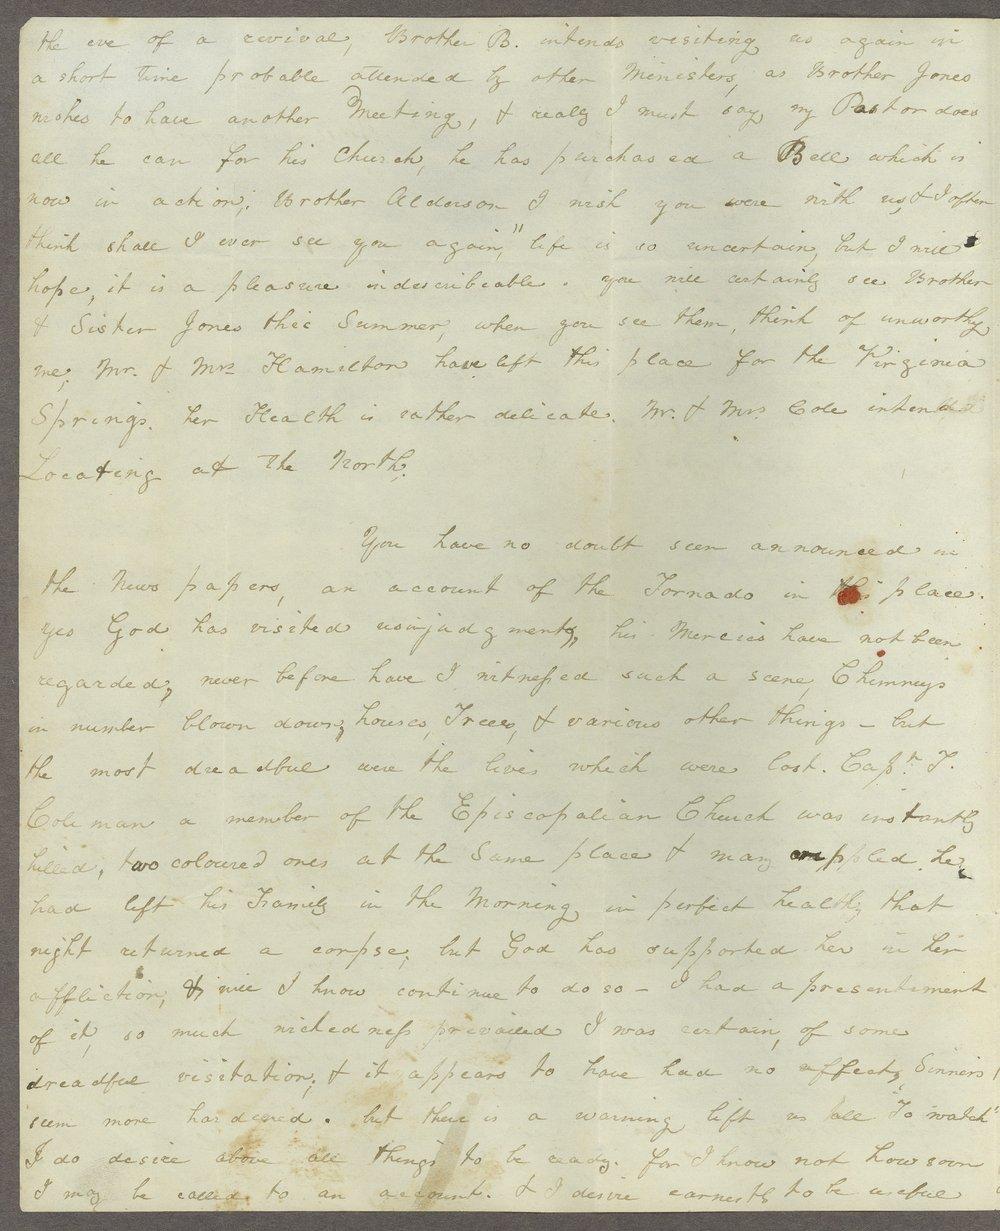 Louisa E. White to Lewis Allen Alderson - 10